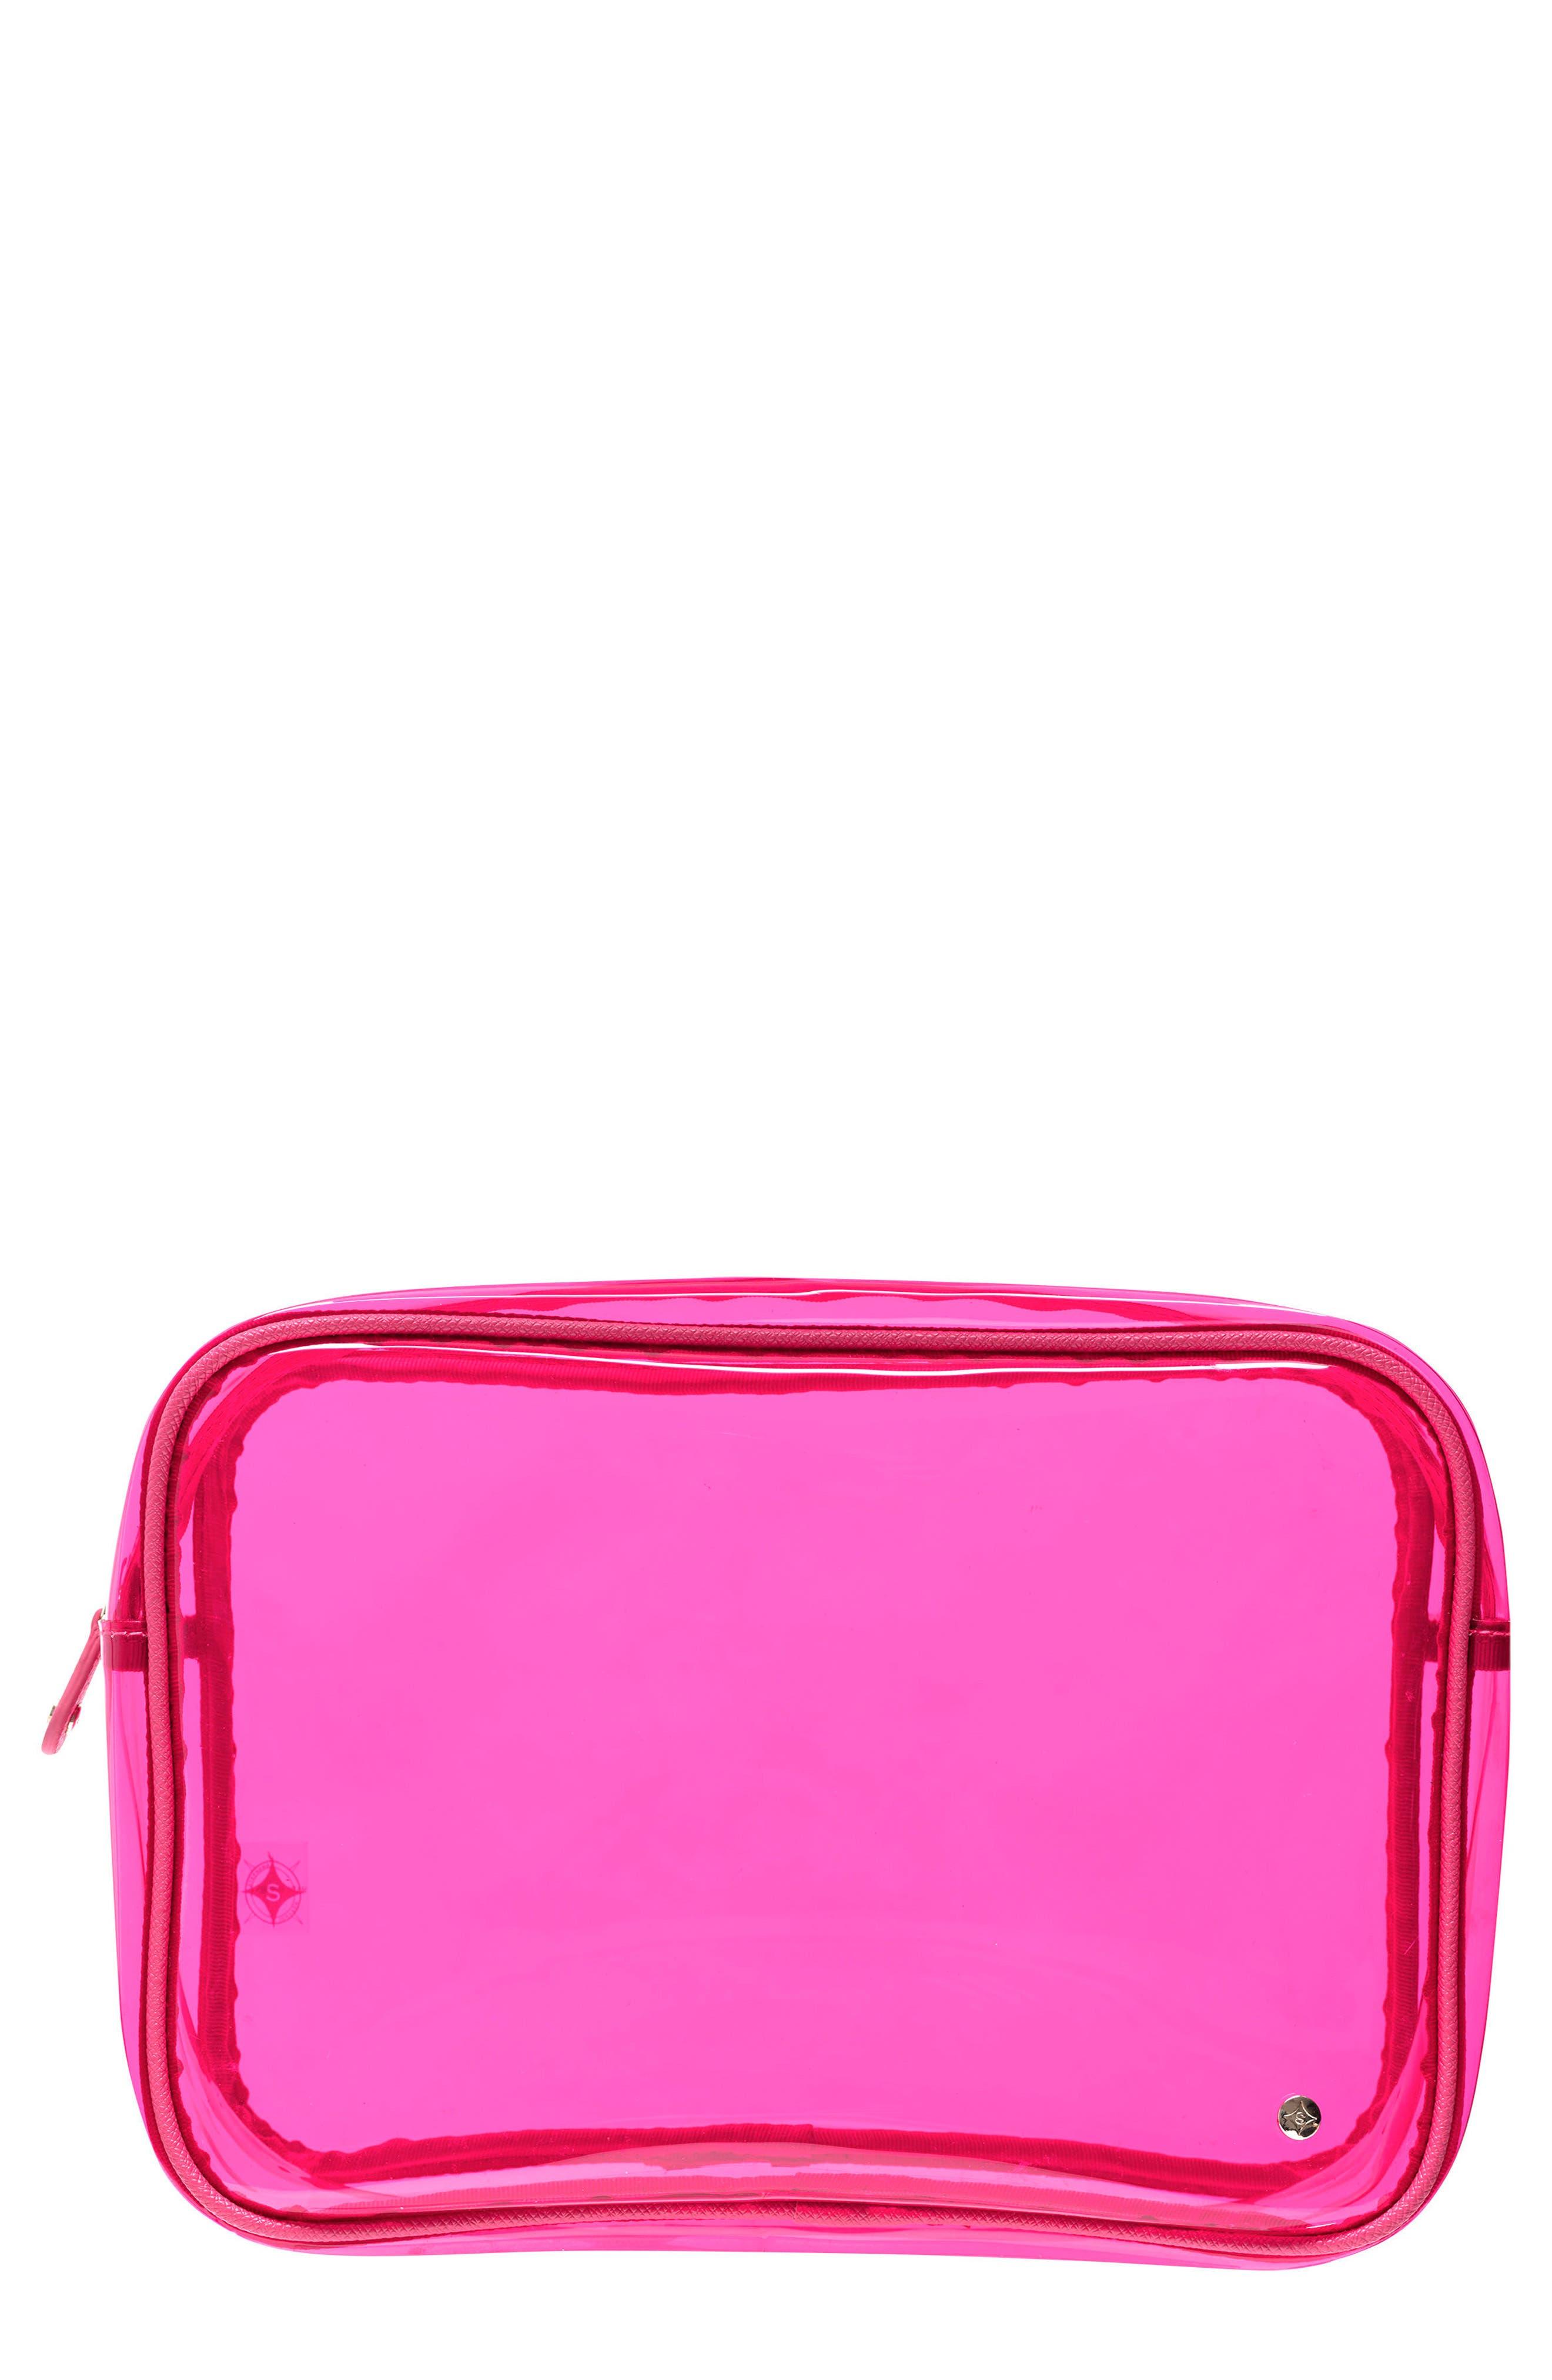 Stephanie Johnson Miami Jumbo Zip Cosmetics Case